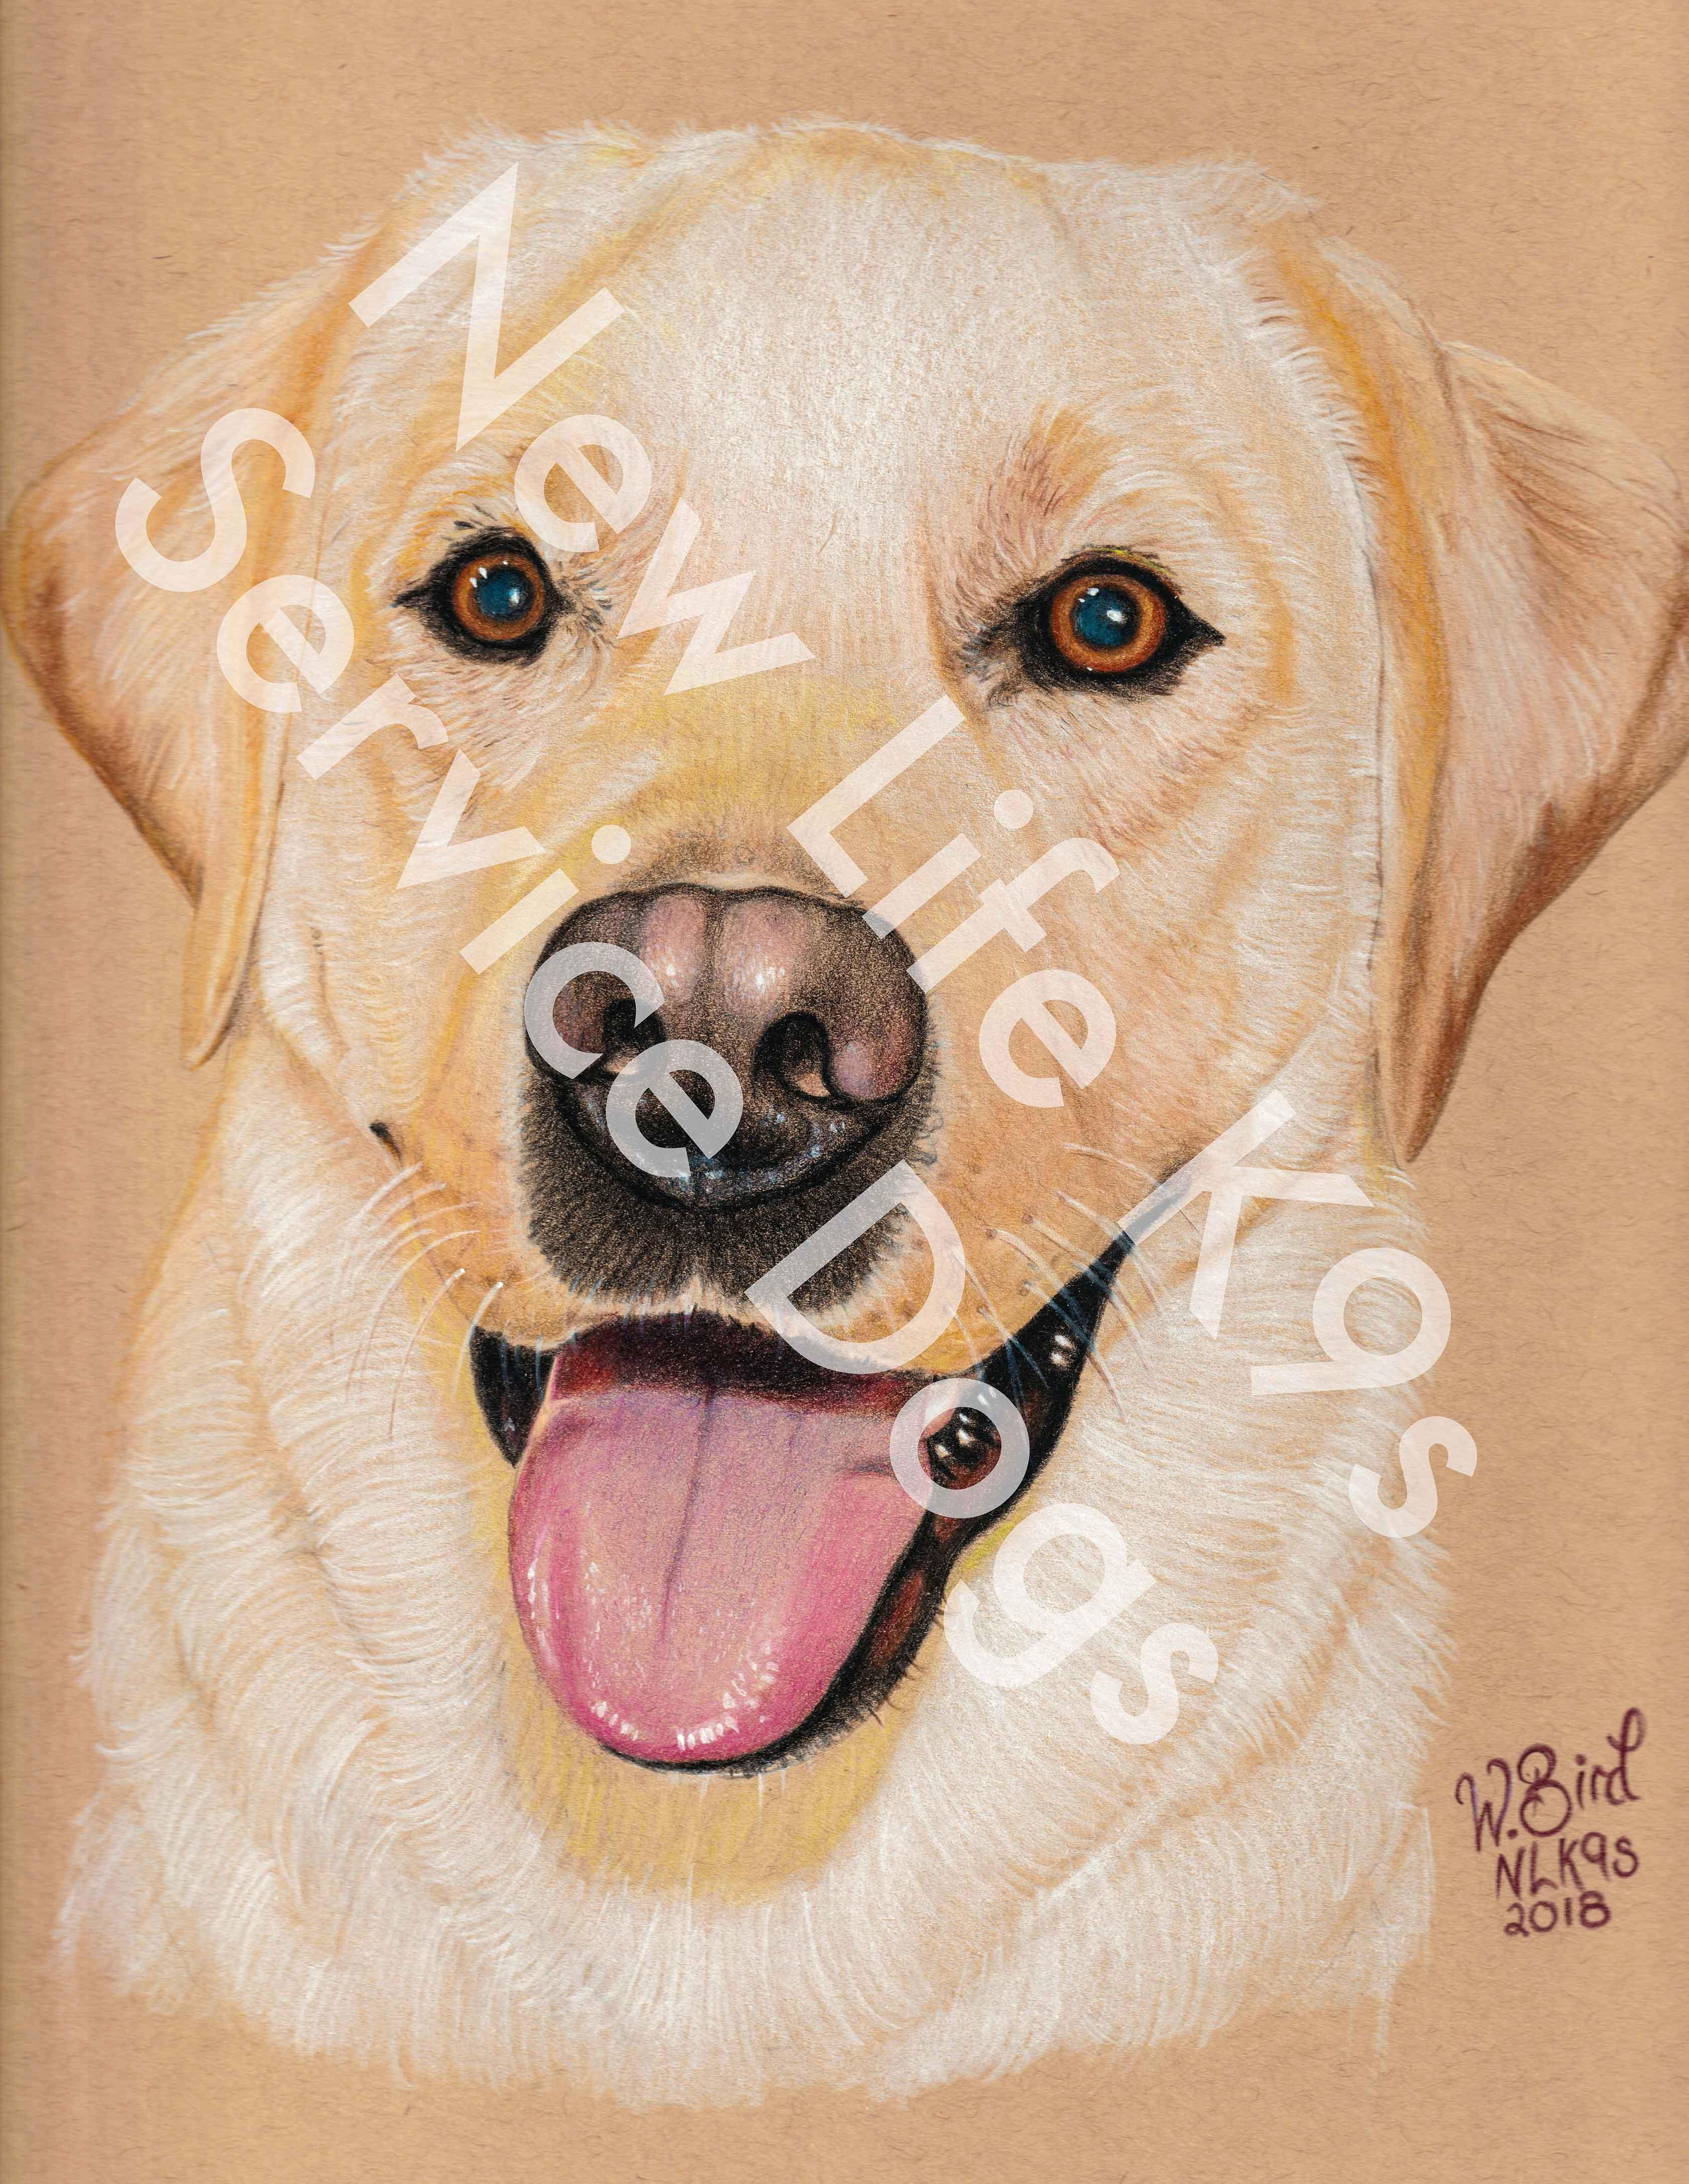 Eddie the Labrador